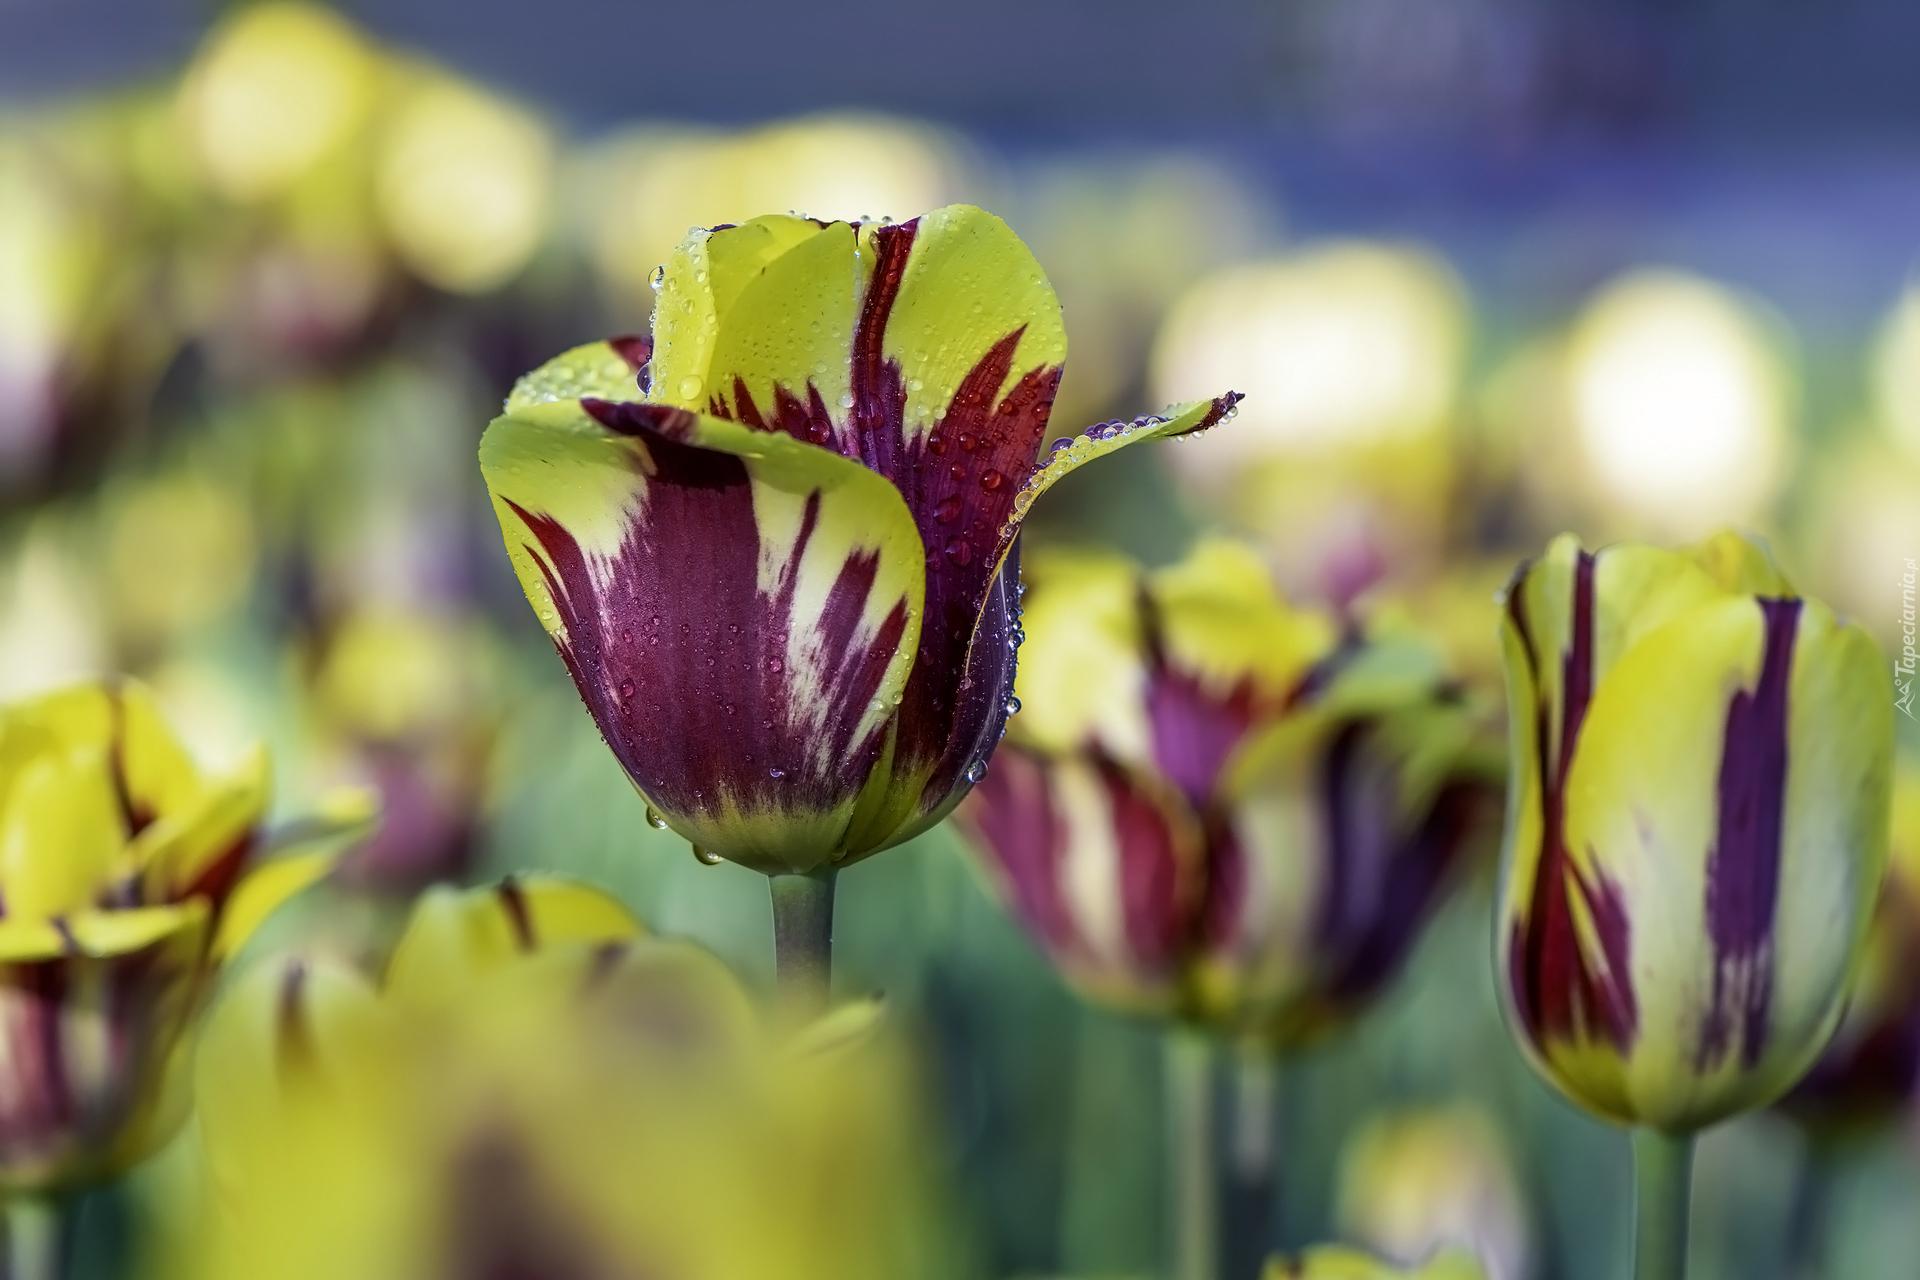 tapeta-zolto-fioletowe-tulipany-na-rozmytym-tle.jpg